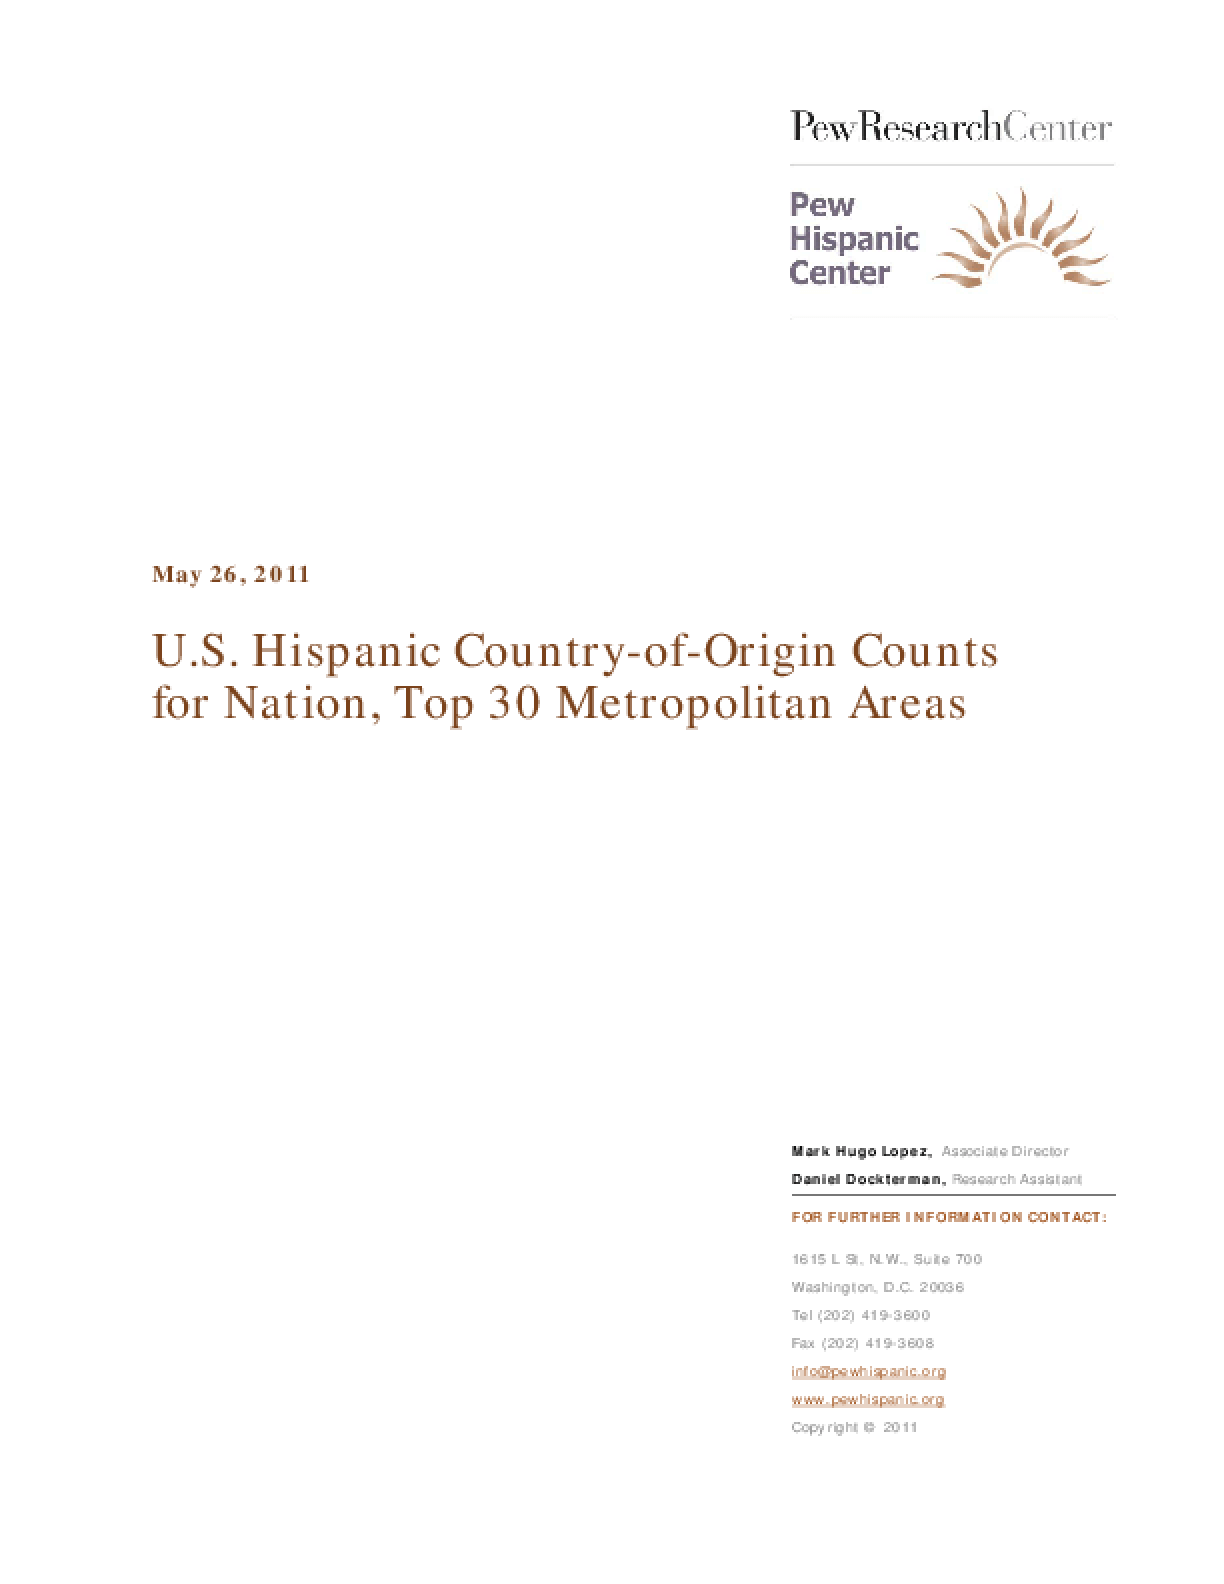 U.S. Hispanic Country-of-Origin Counts for Nation, Top 30 Metropolitan Areas